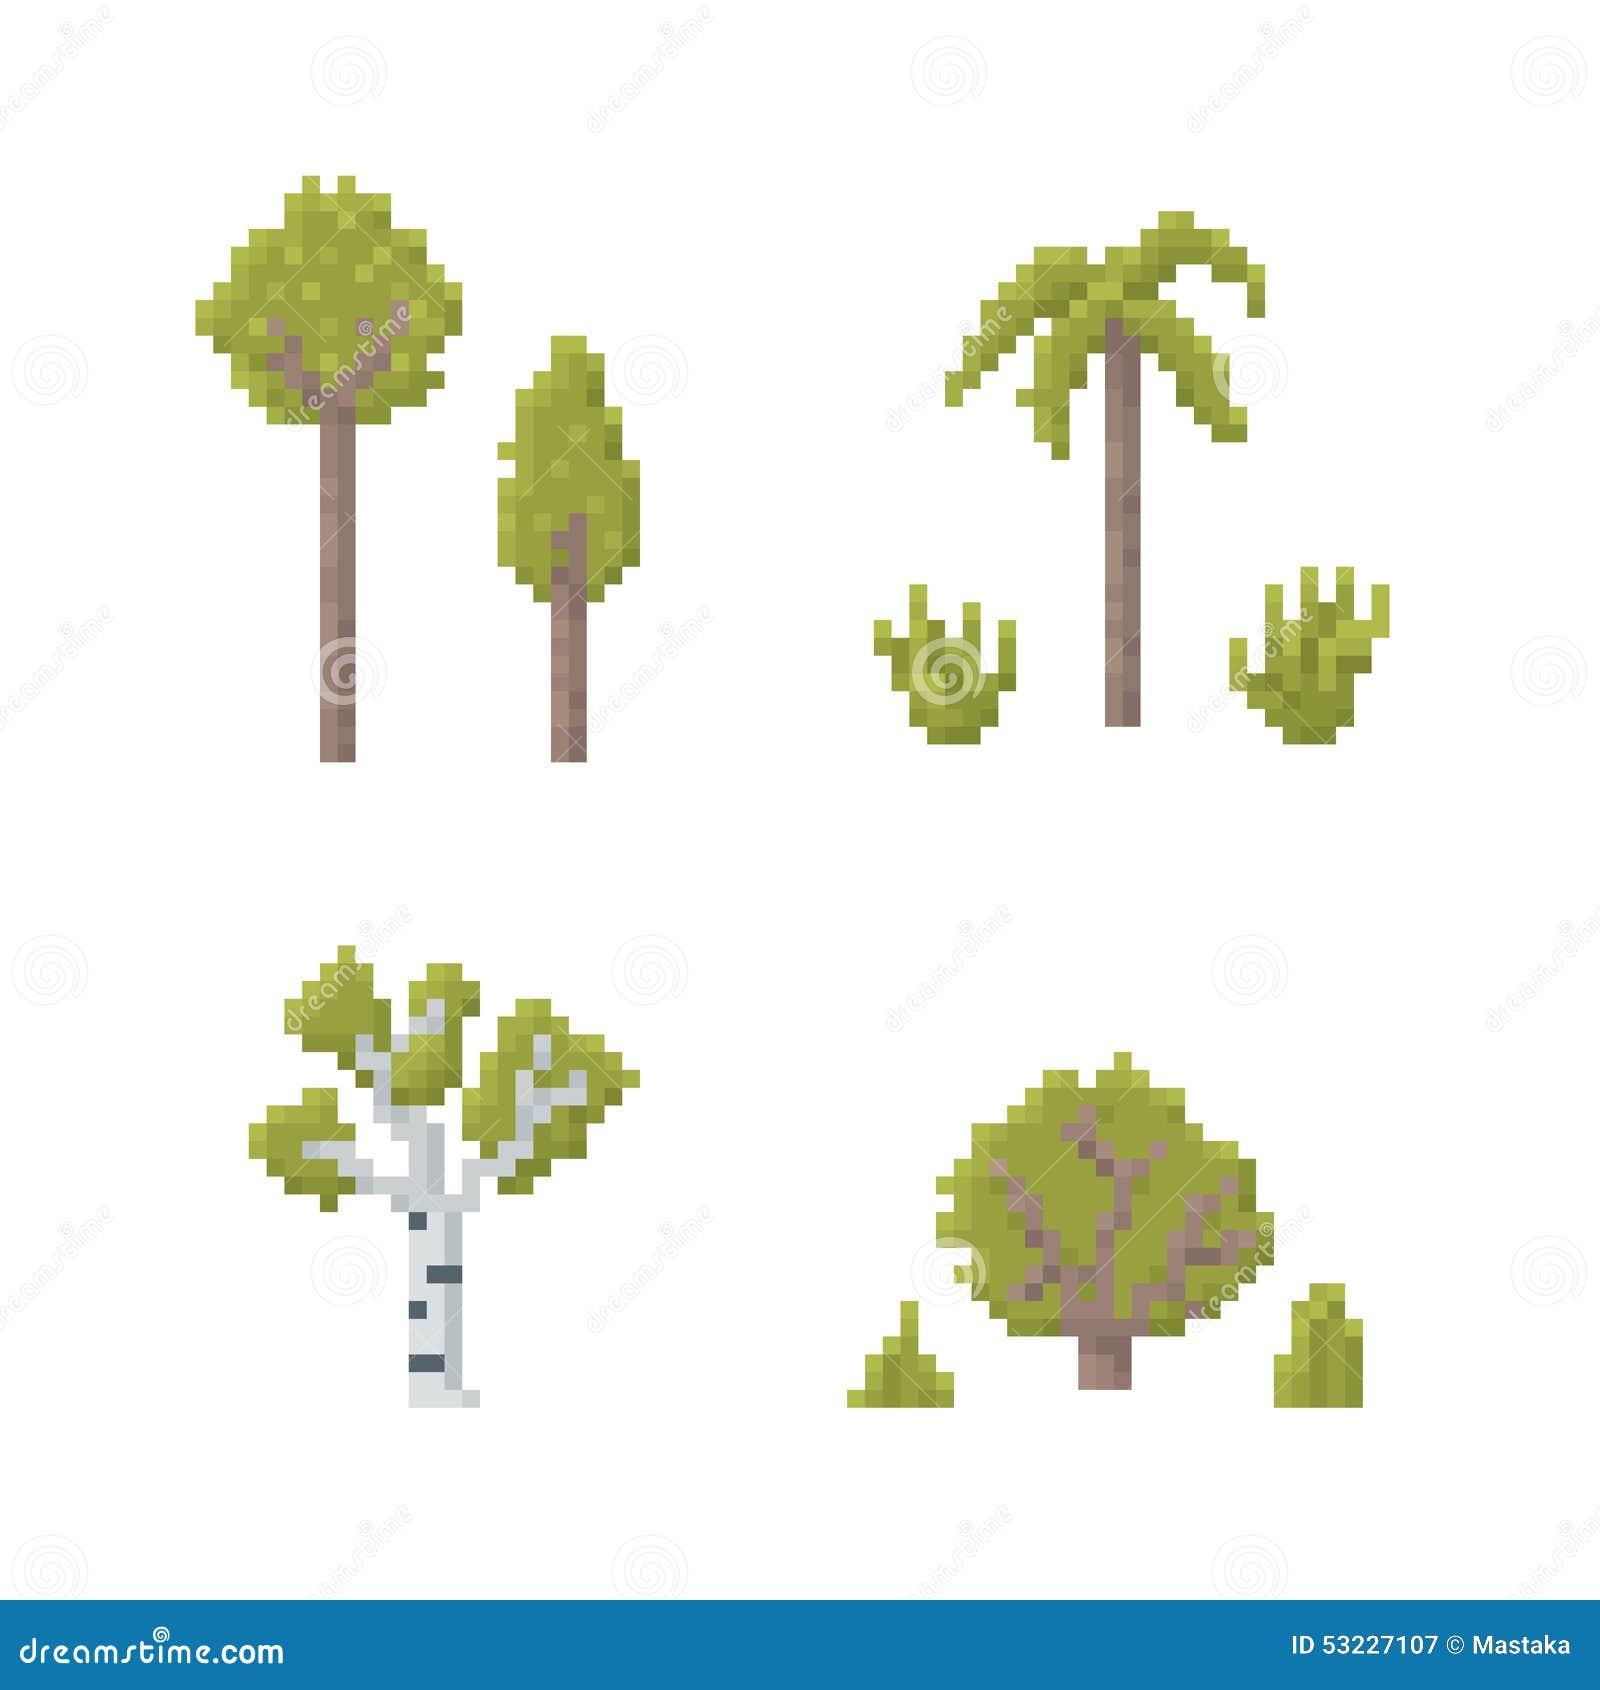 Pixel Art Trees